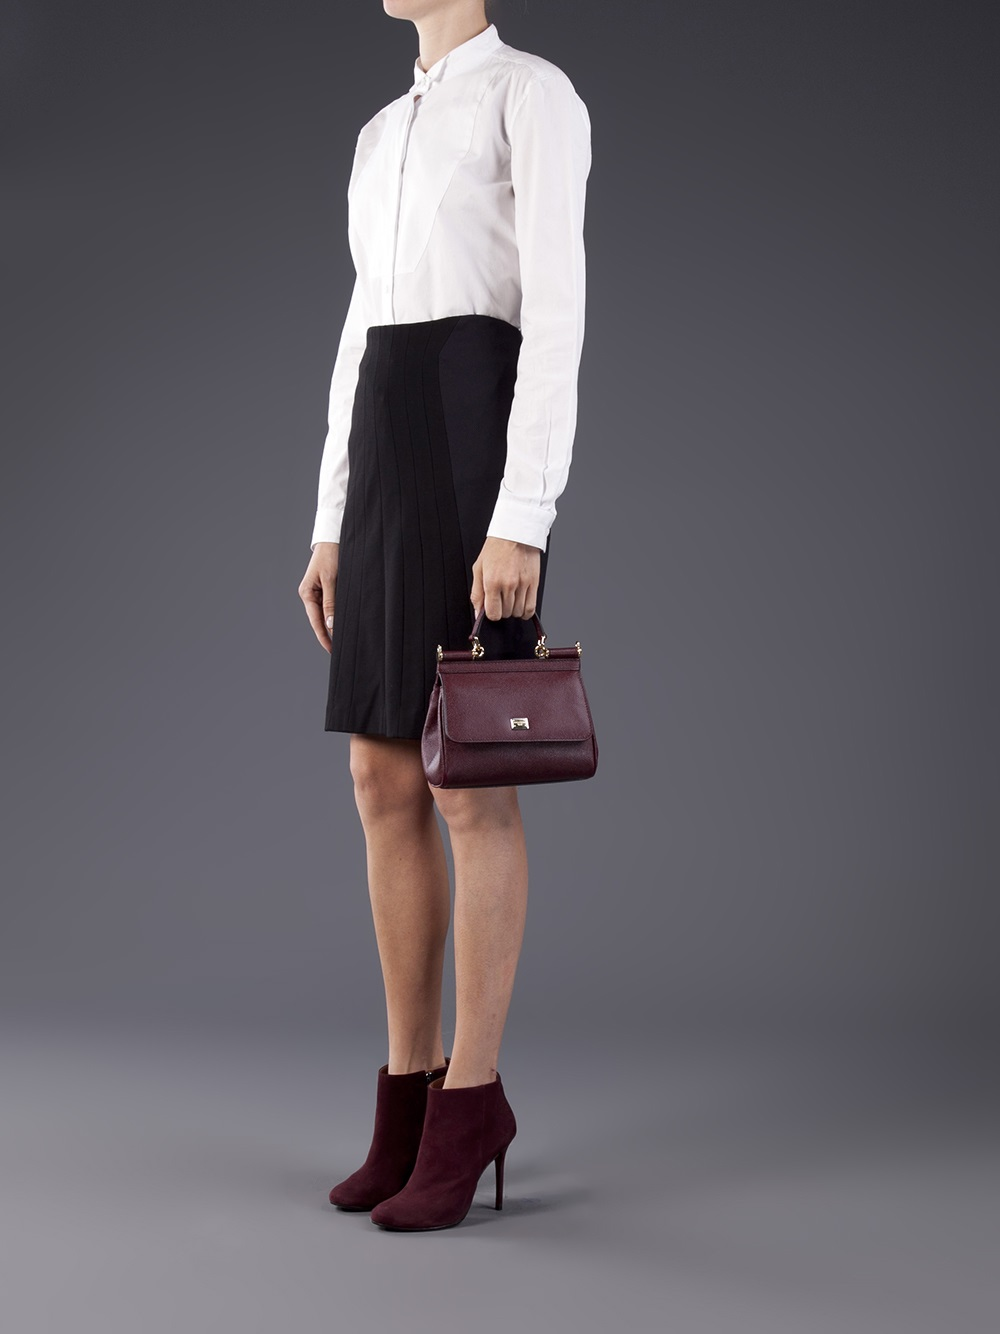 Dolce & Gabbana Sicily small handbag z9FEqNS